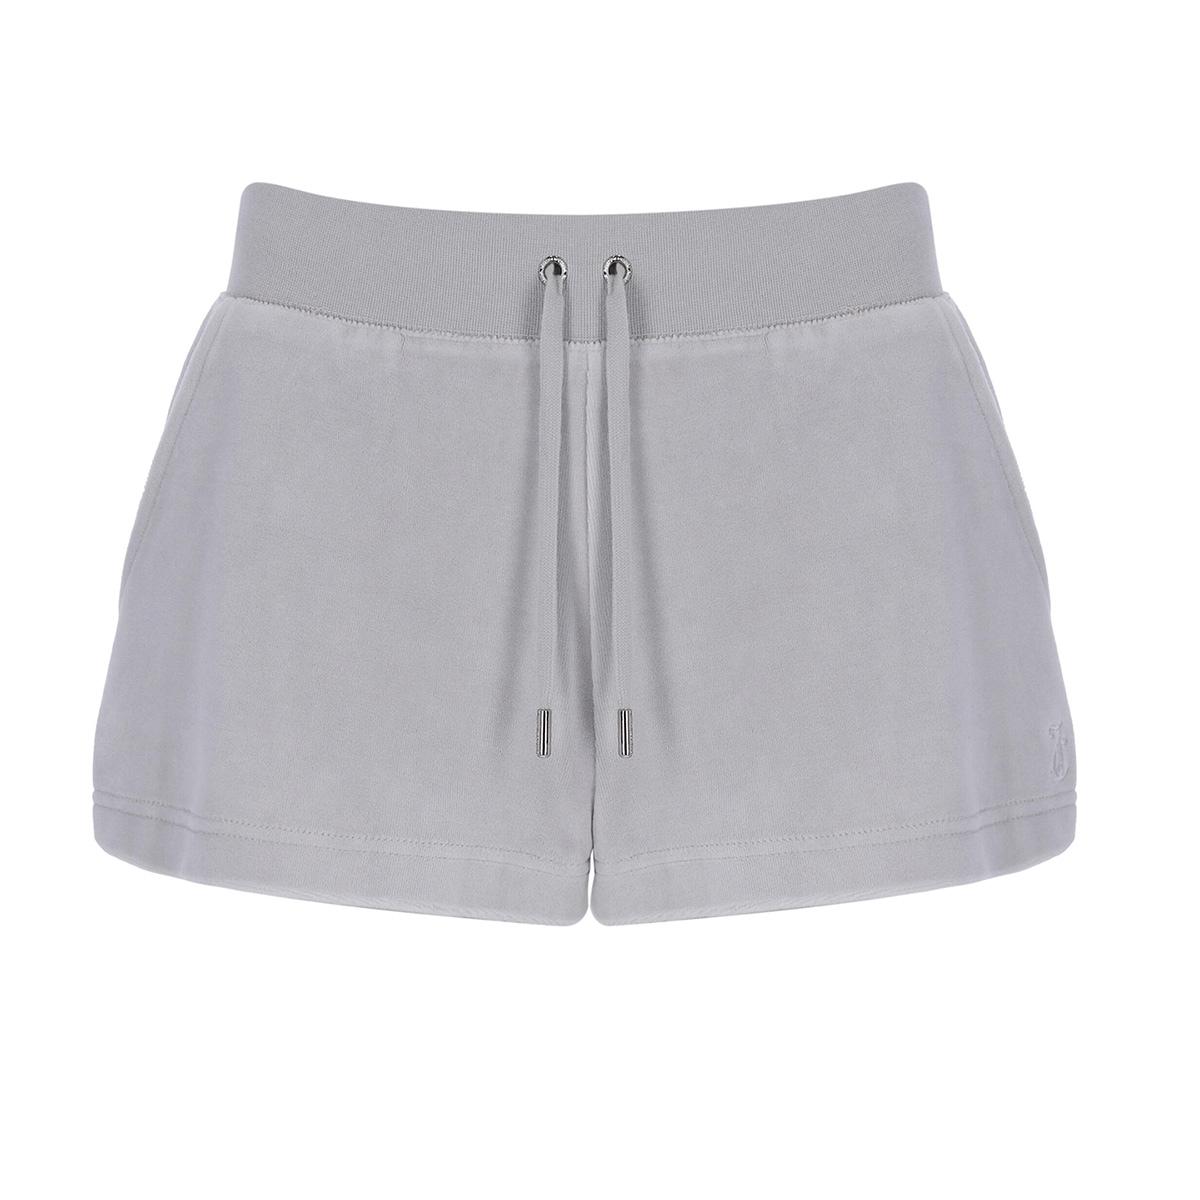 Juicy Couture - Shorts Eve Cotton Rich Quiet Grey